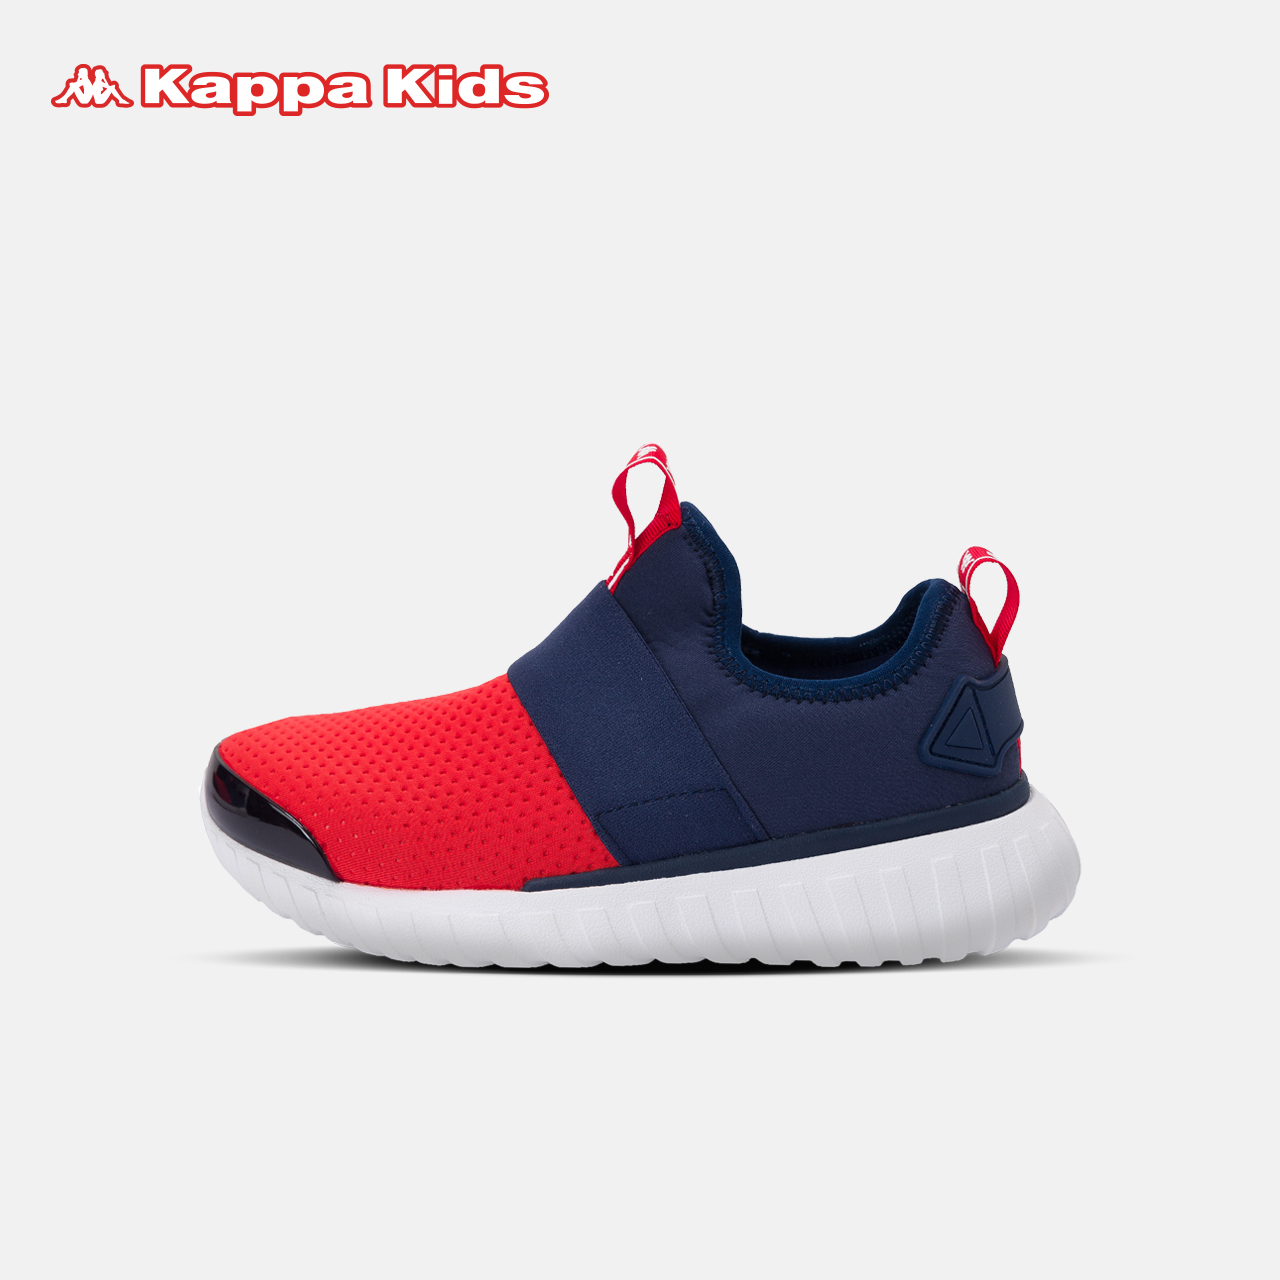 KappaKids童鞋儿童轻质运动鞋男女童中大童休闲鞋透气时尚跑鞋